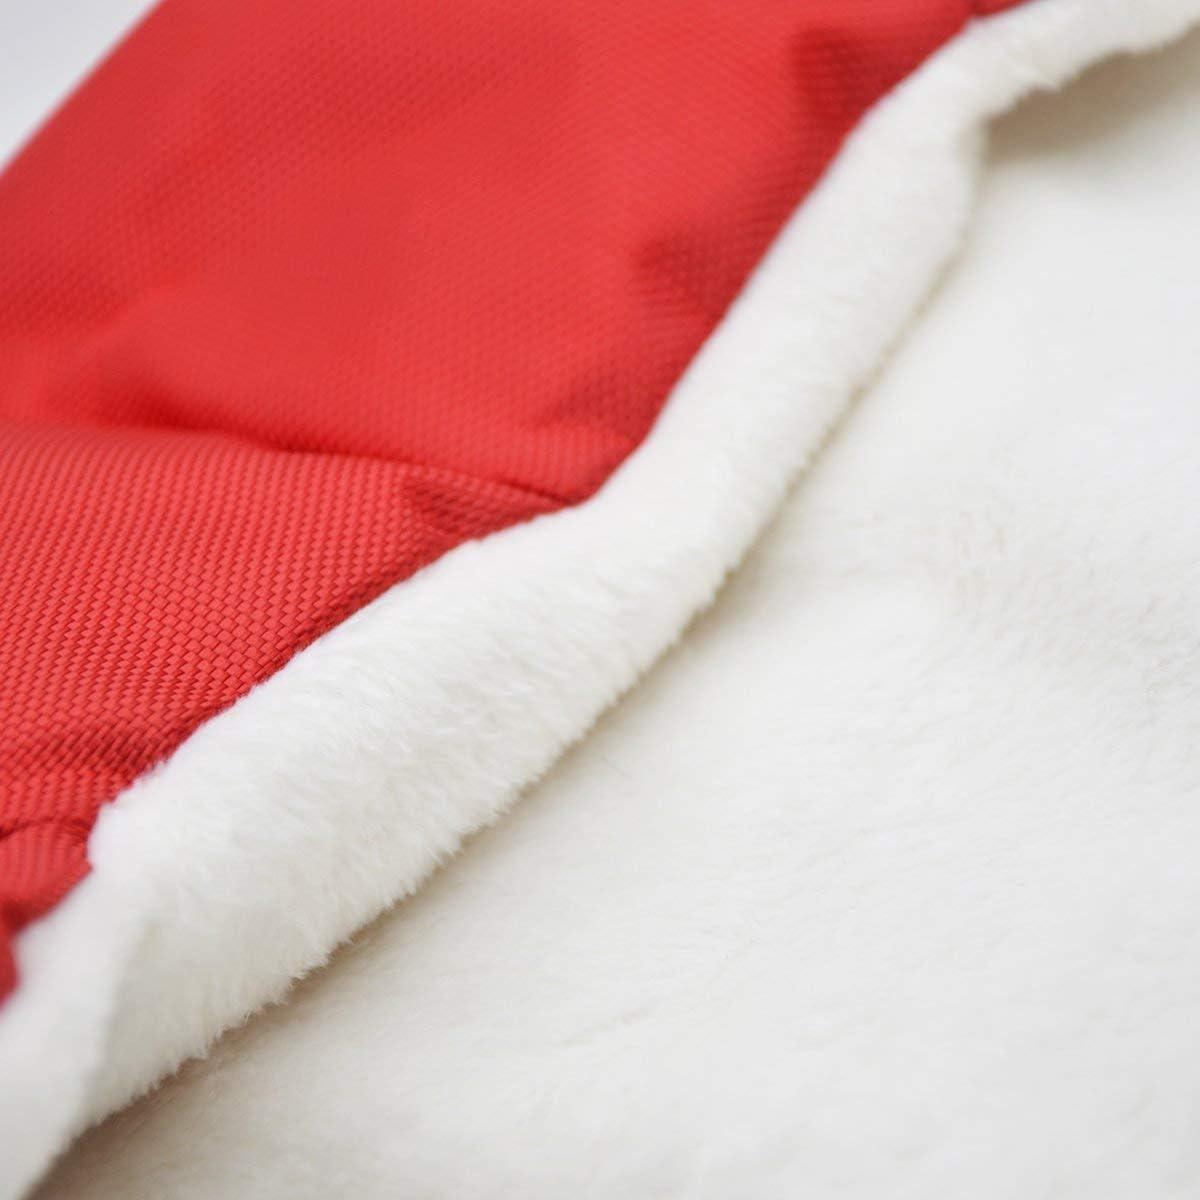 Impermeable Manoplas Guantes para Cochecito de Bebe Invierno Protege Manos Guantes Caliente YAHUANG Guantes Silla de Paseo